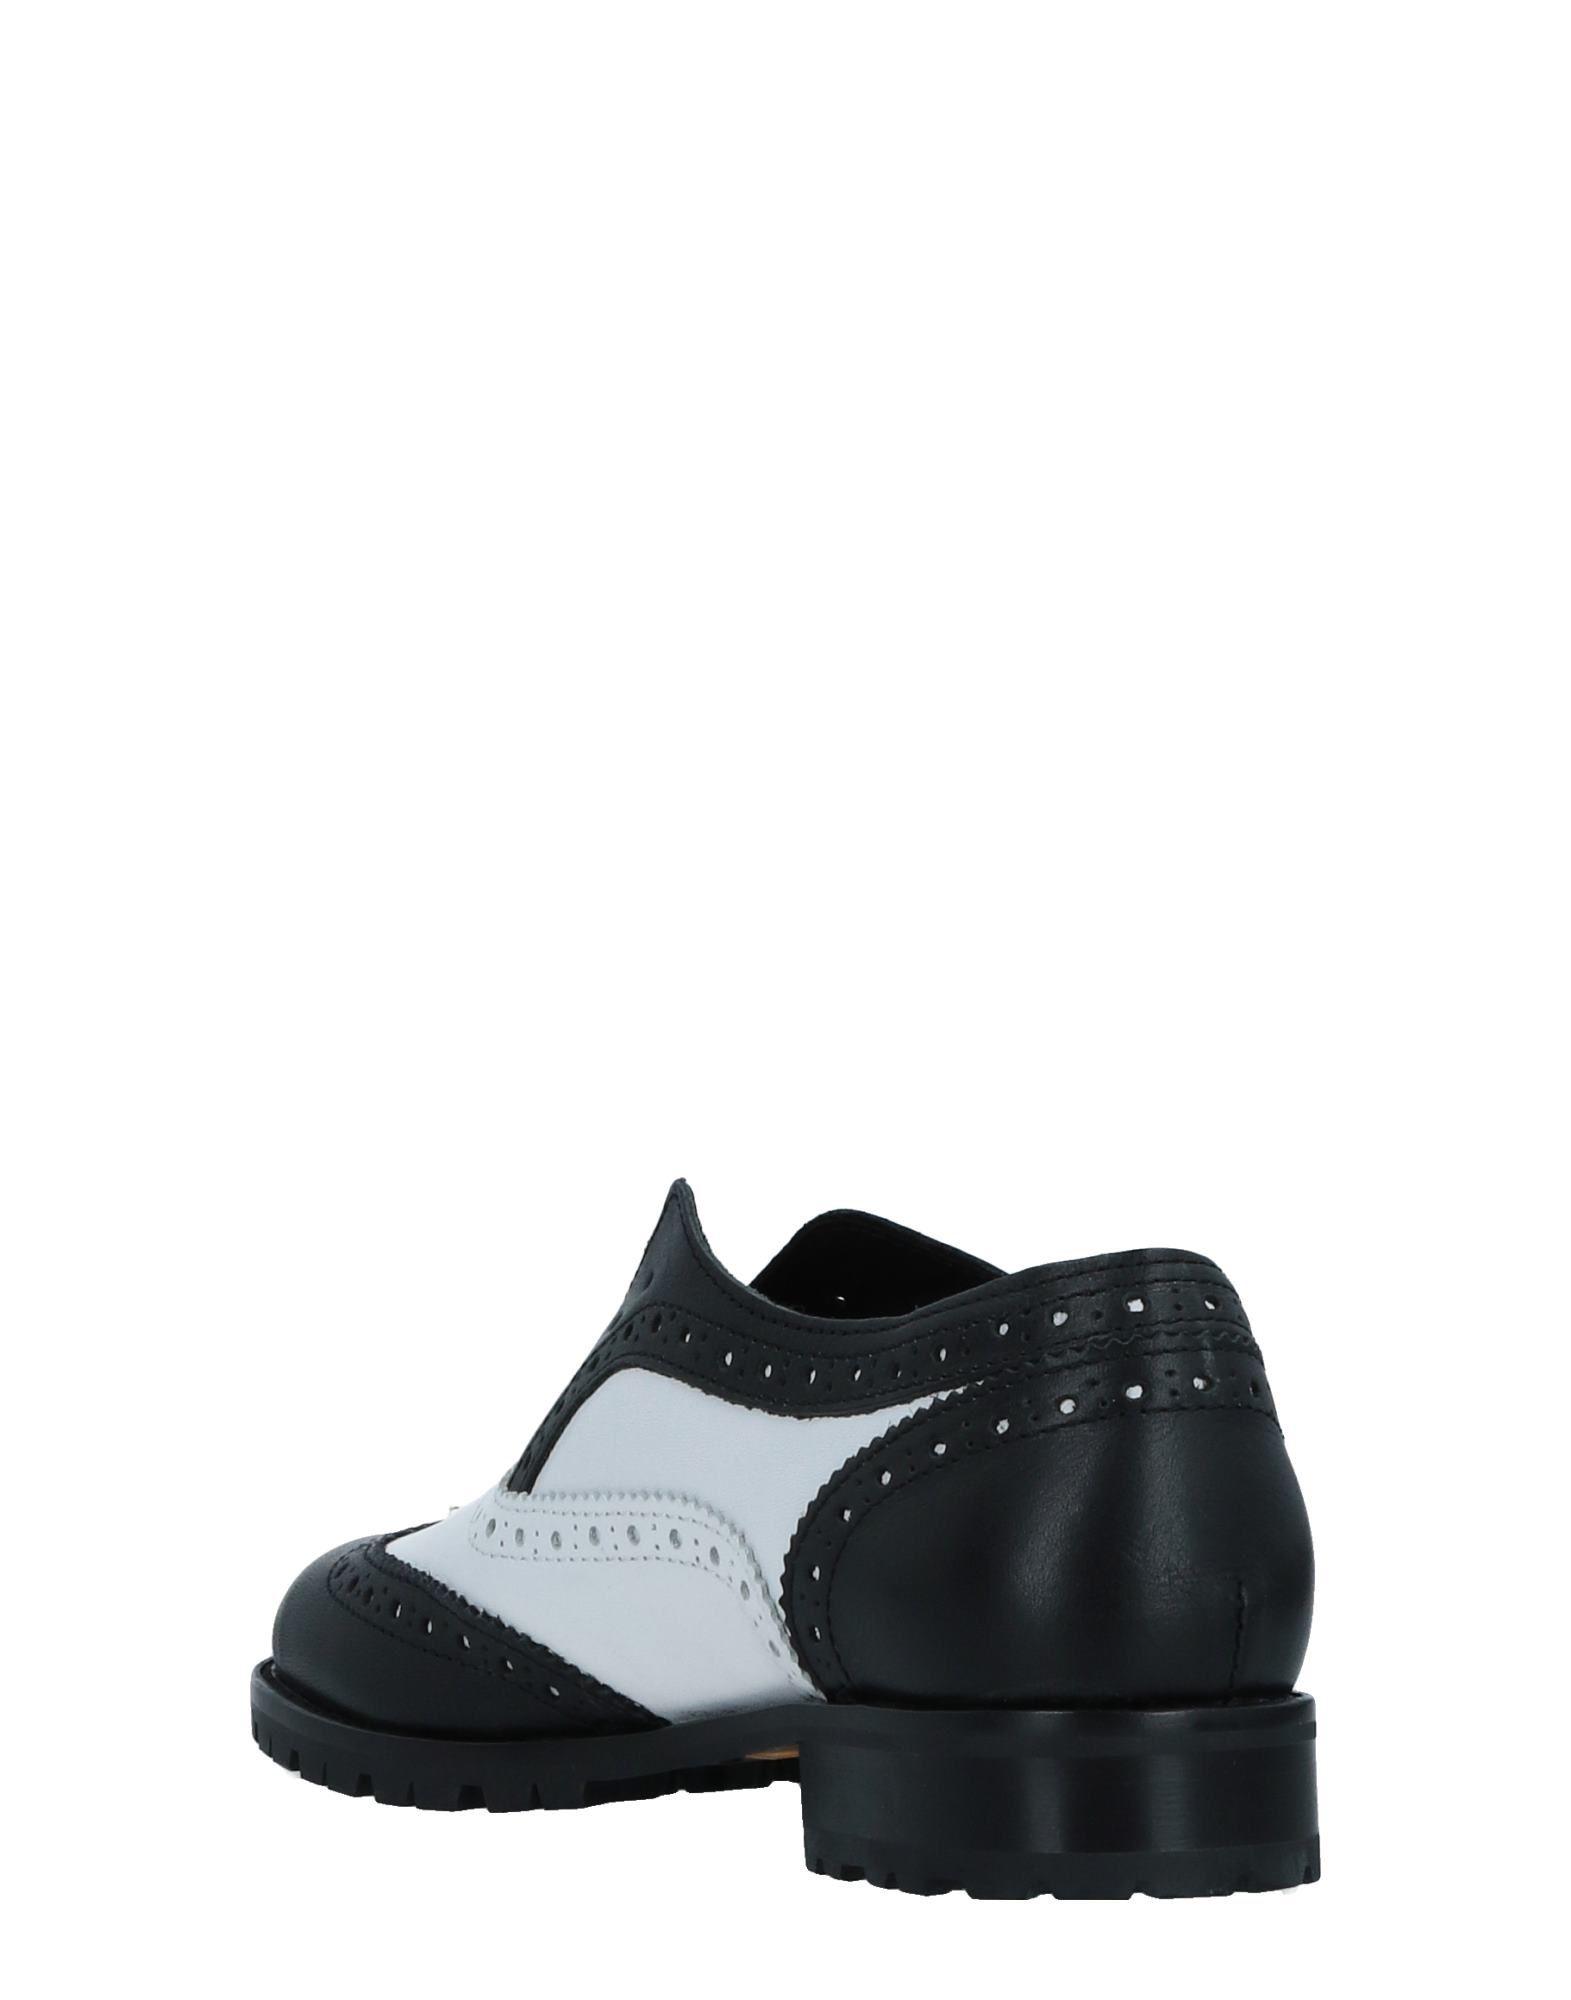 l & # ; femmes f chaussures mocassins - femmes ; l & # ; f chaussures des mocassins en ligne sur l'australie - ke ba5ddd